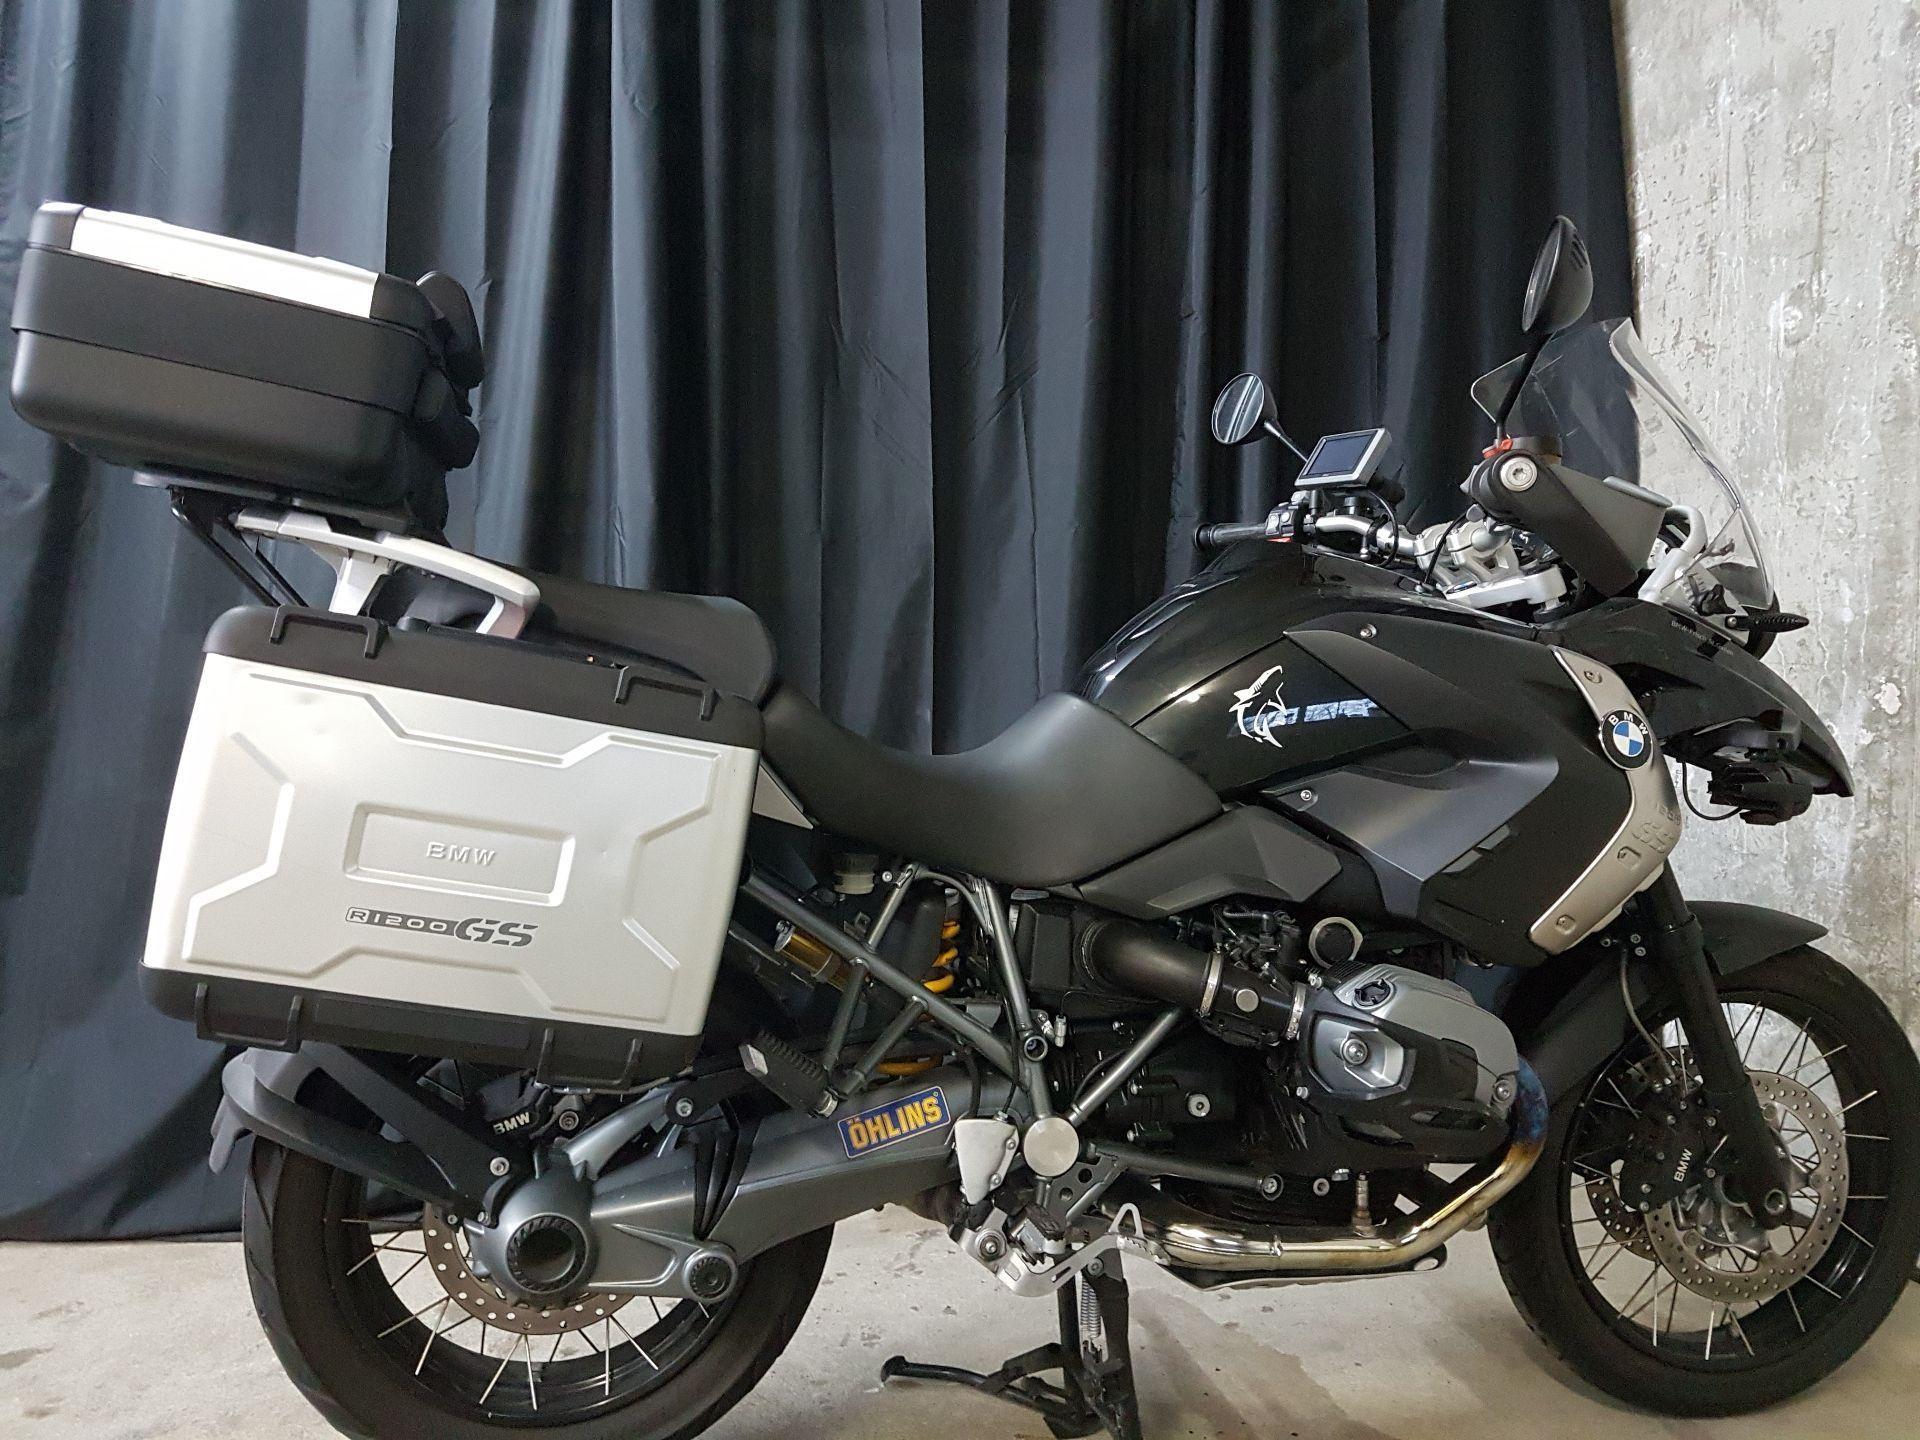 moto occasions acheter bmw r 1200 gs triple black berserker cycles untereggen. Black Bedroom Furniture Sets. Home Design Ideas